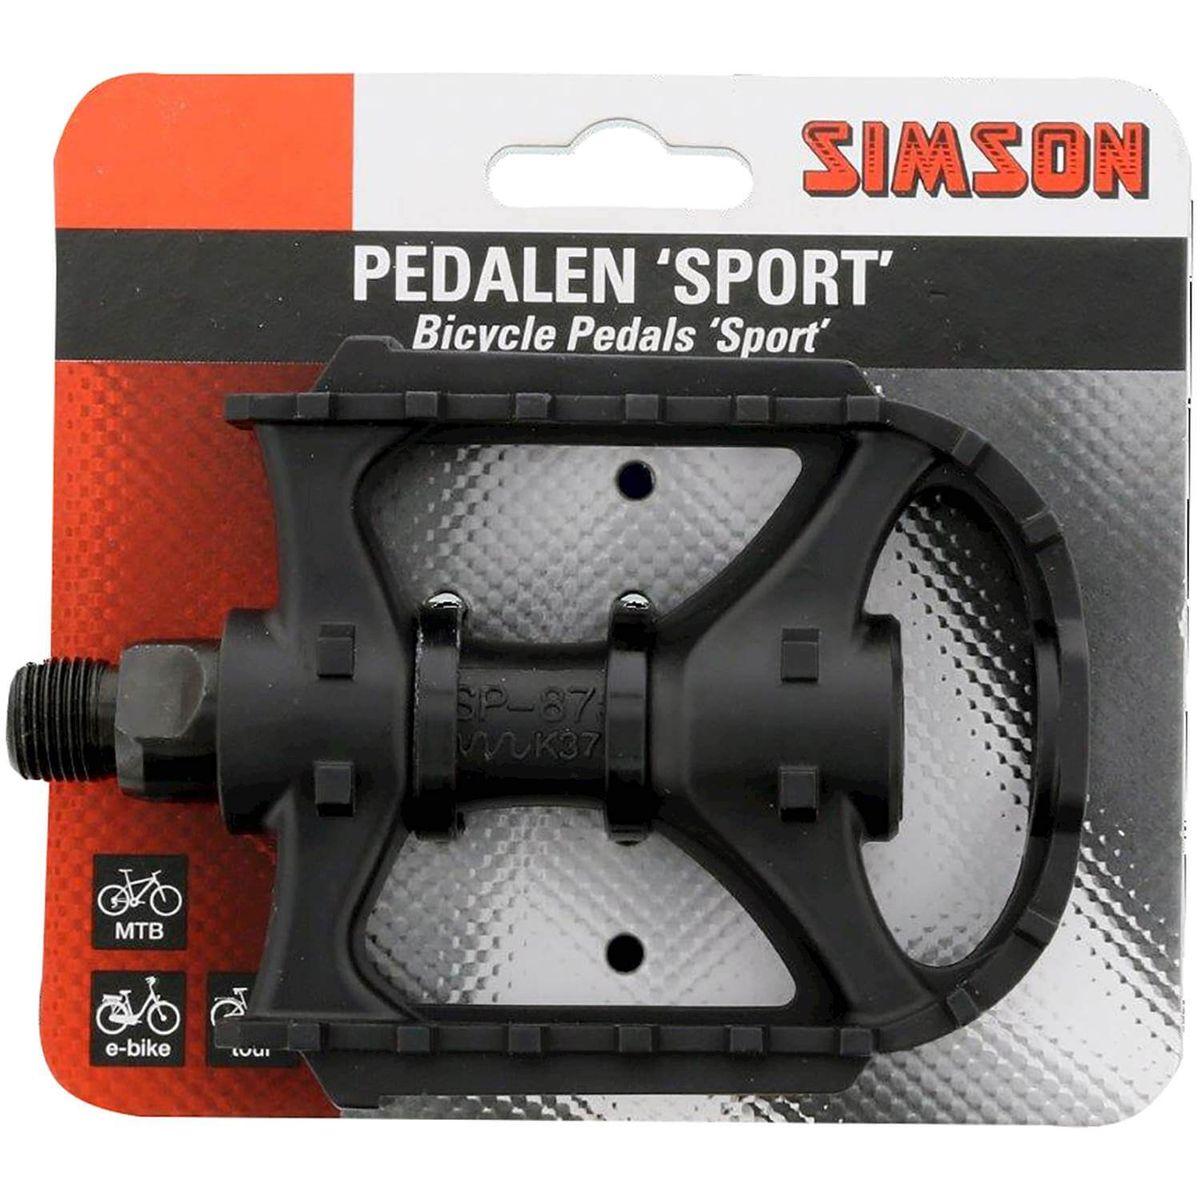 Simson pedaalset sport reflectoren (2)